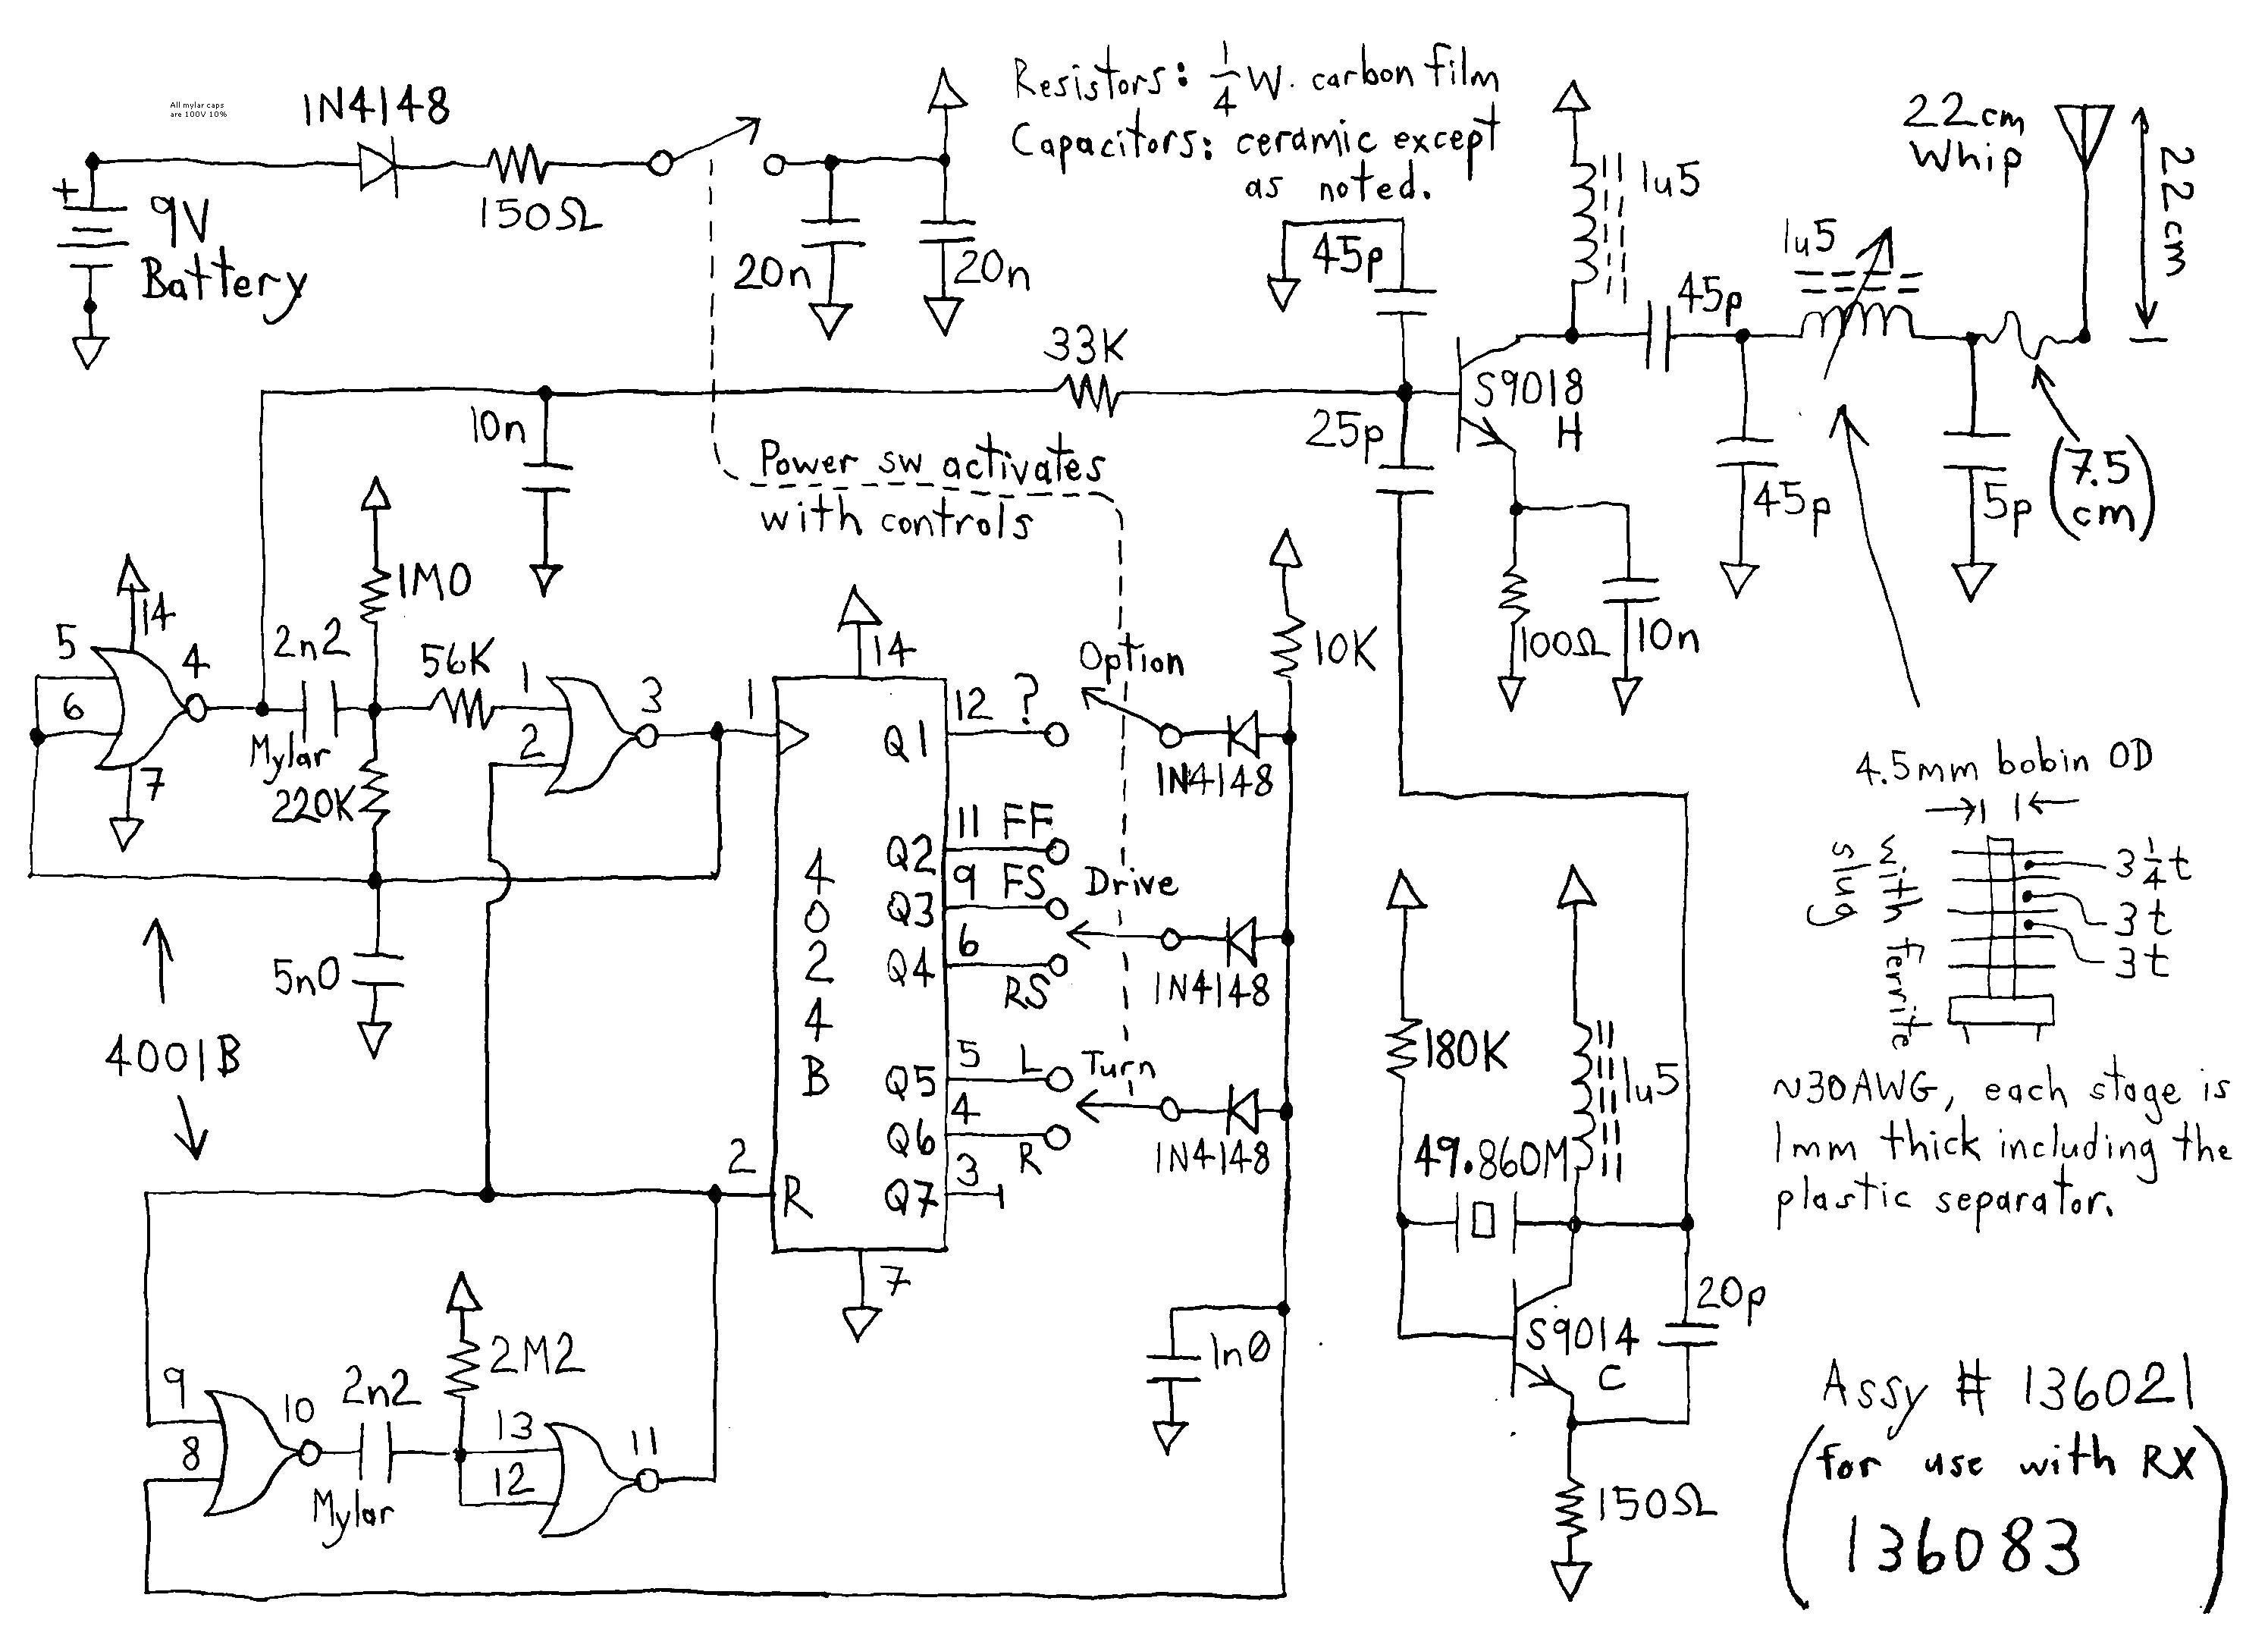 auto electrical wiring diagram pdf my wiring diagram automotive cable pdf automotive electrical wiring diagram symbols